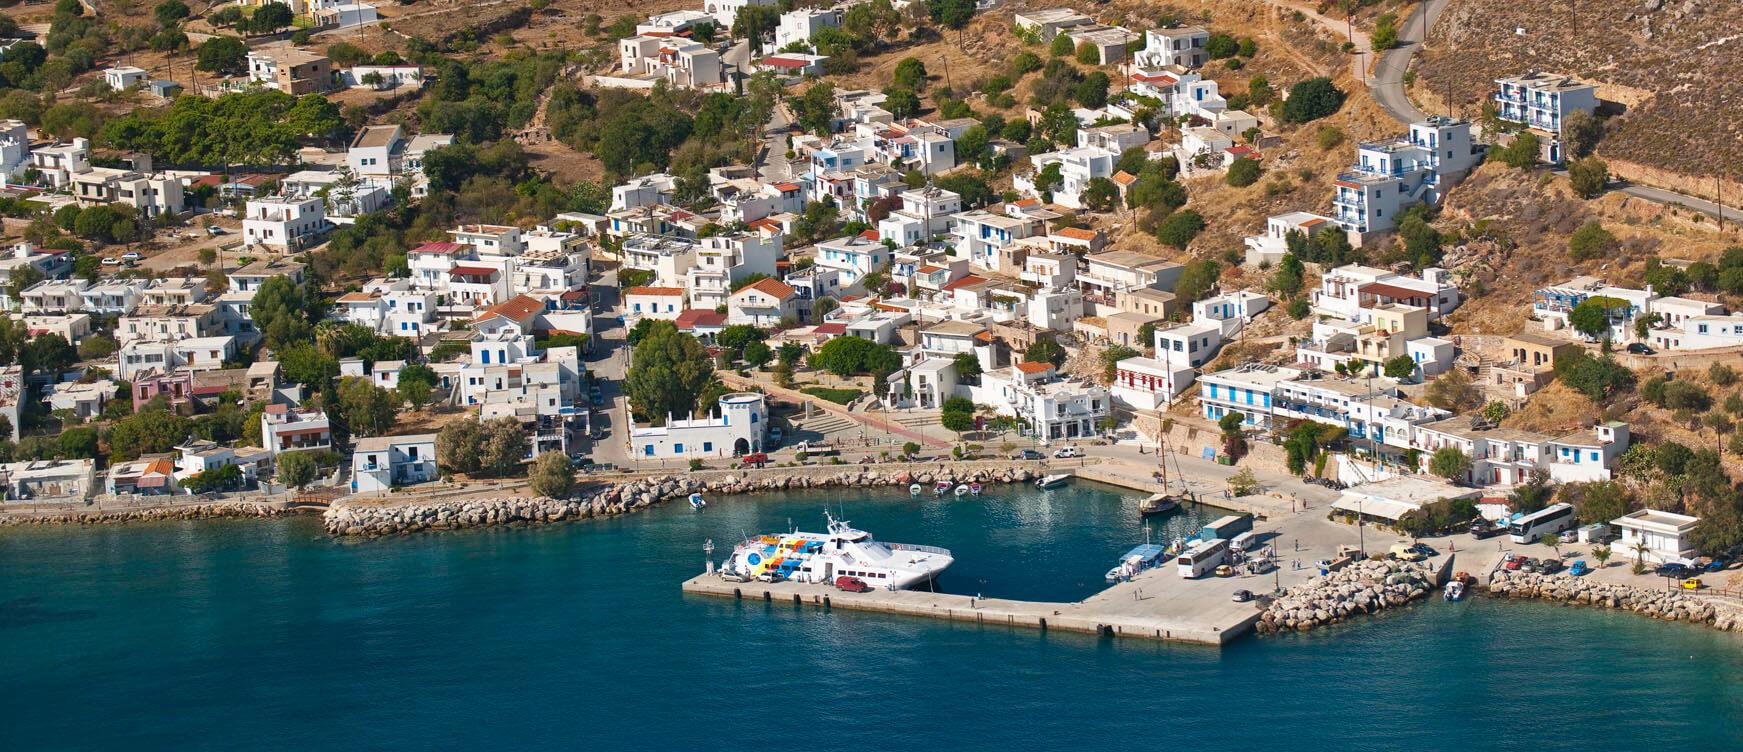 Остров Тилос и Святой Пантелеймон